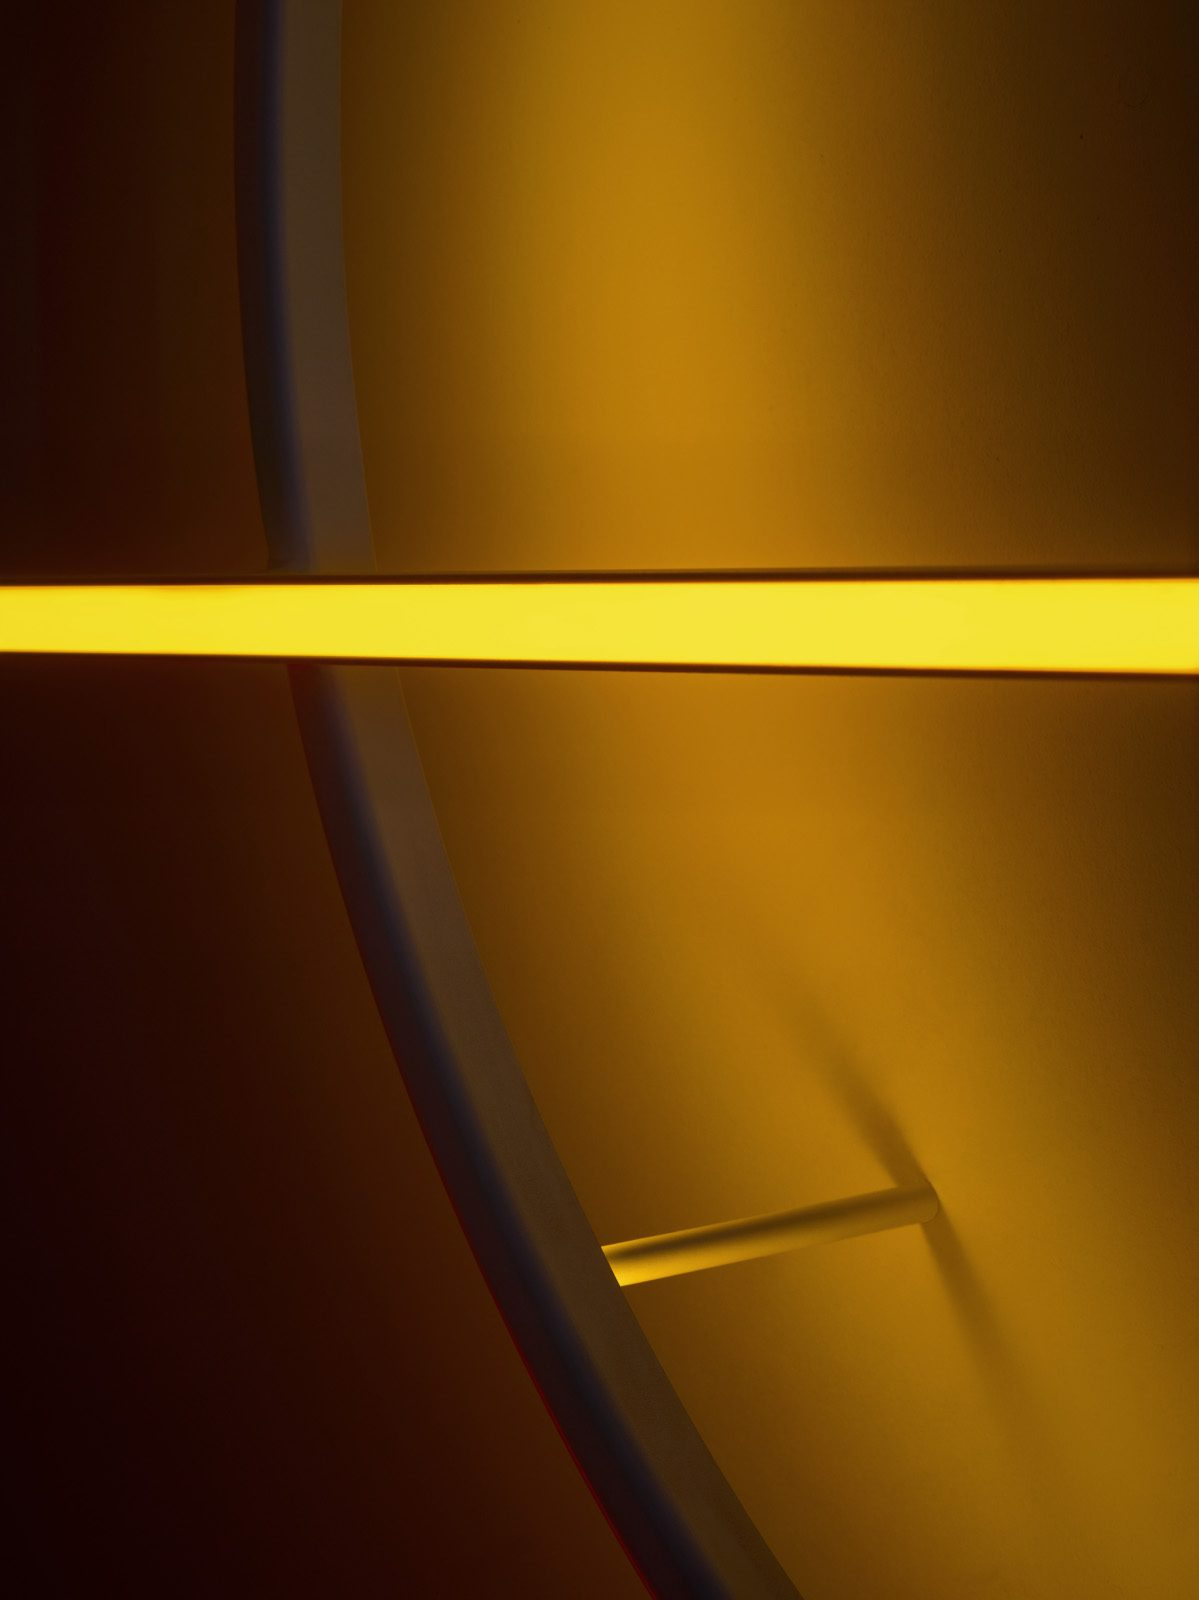 Mist Lamp Hanglamp Wandlamp Ontwerpduo